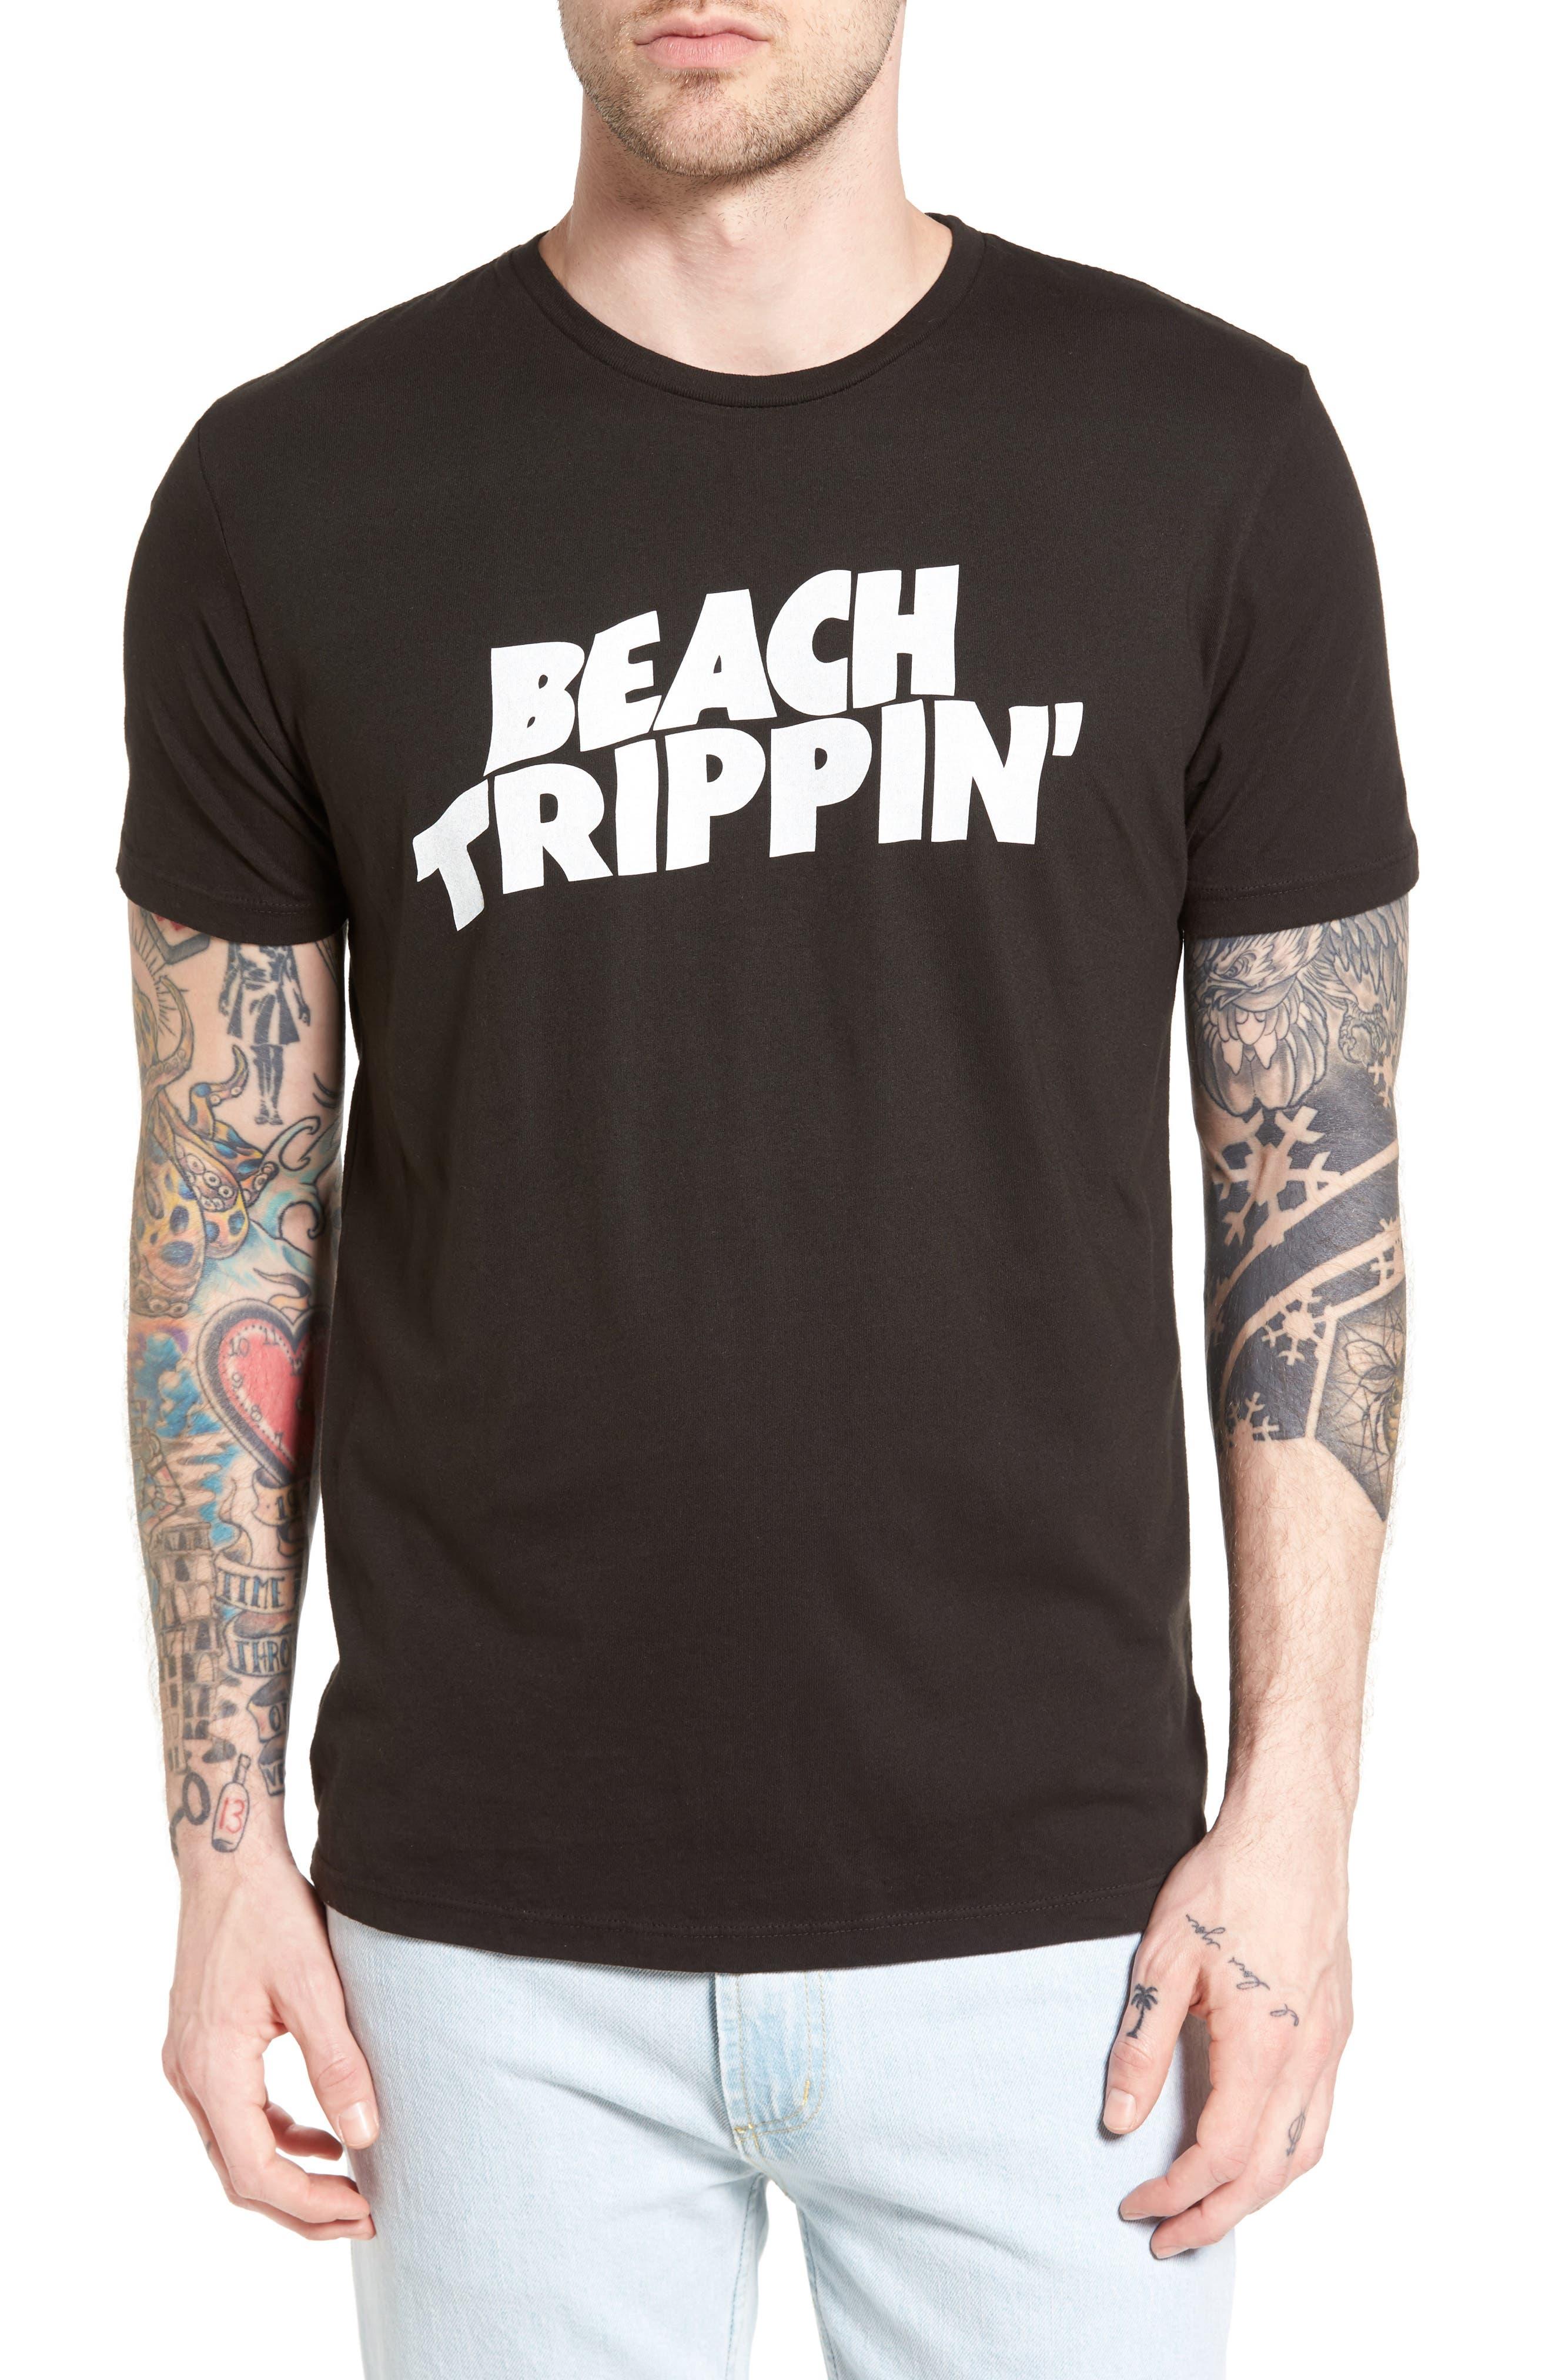 Beach Trippin' Graphic T-Shirt,                         Main,                         color, 090